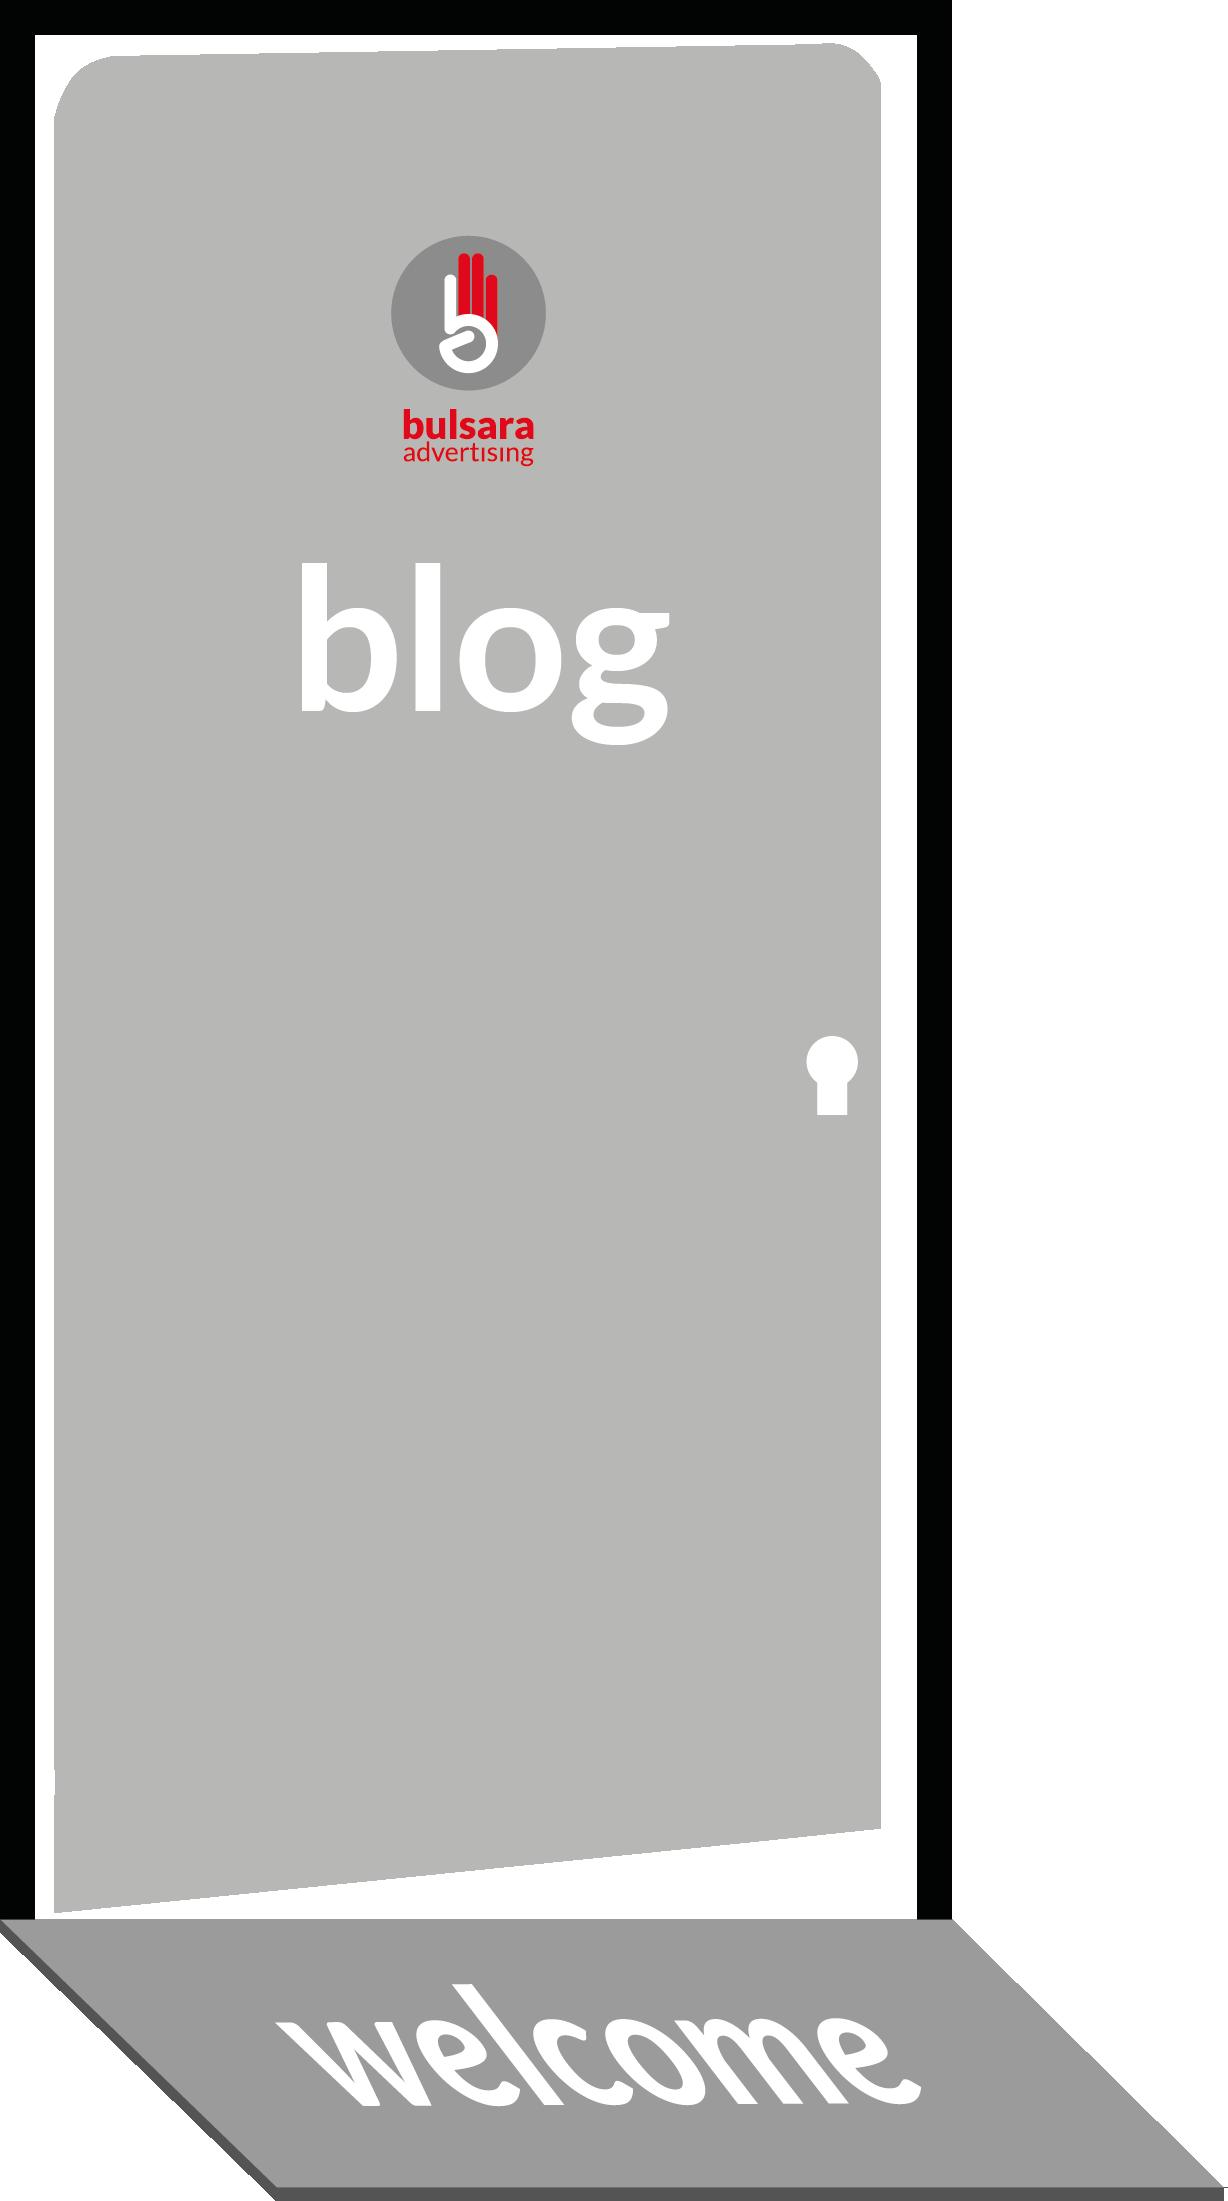 Blog Bulsara ADV